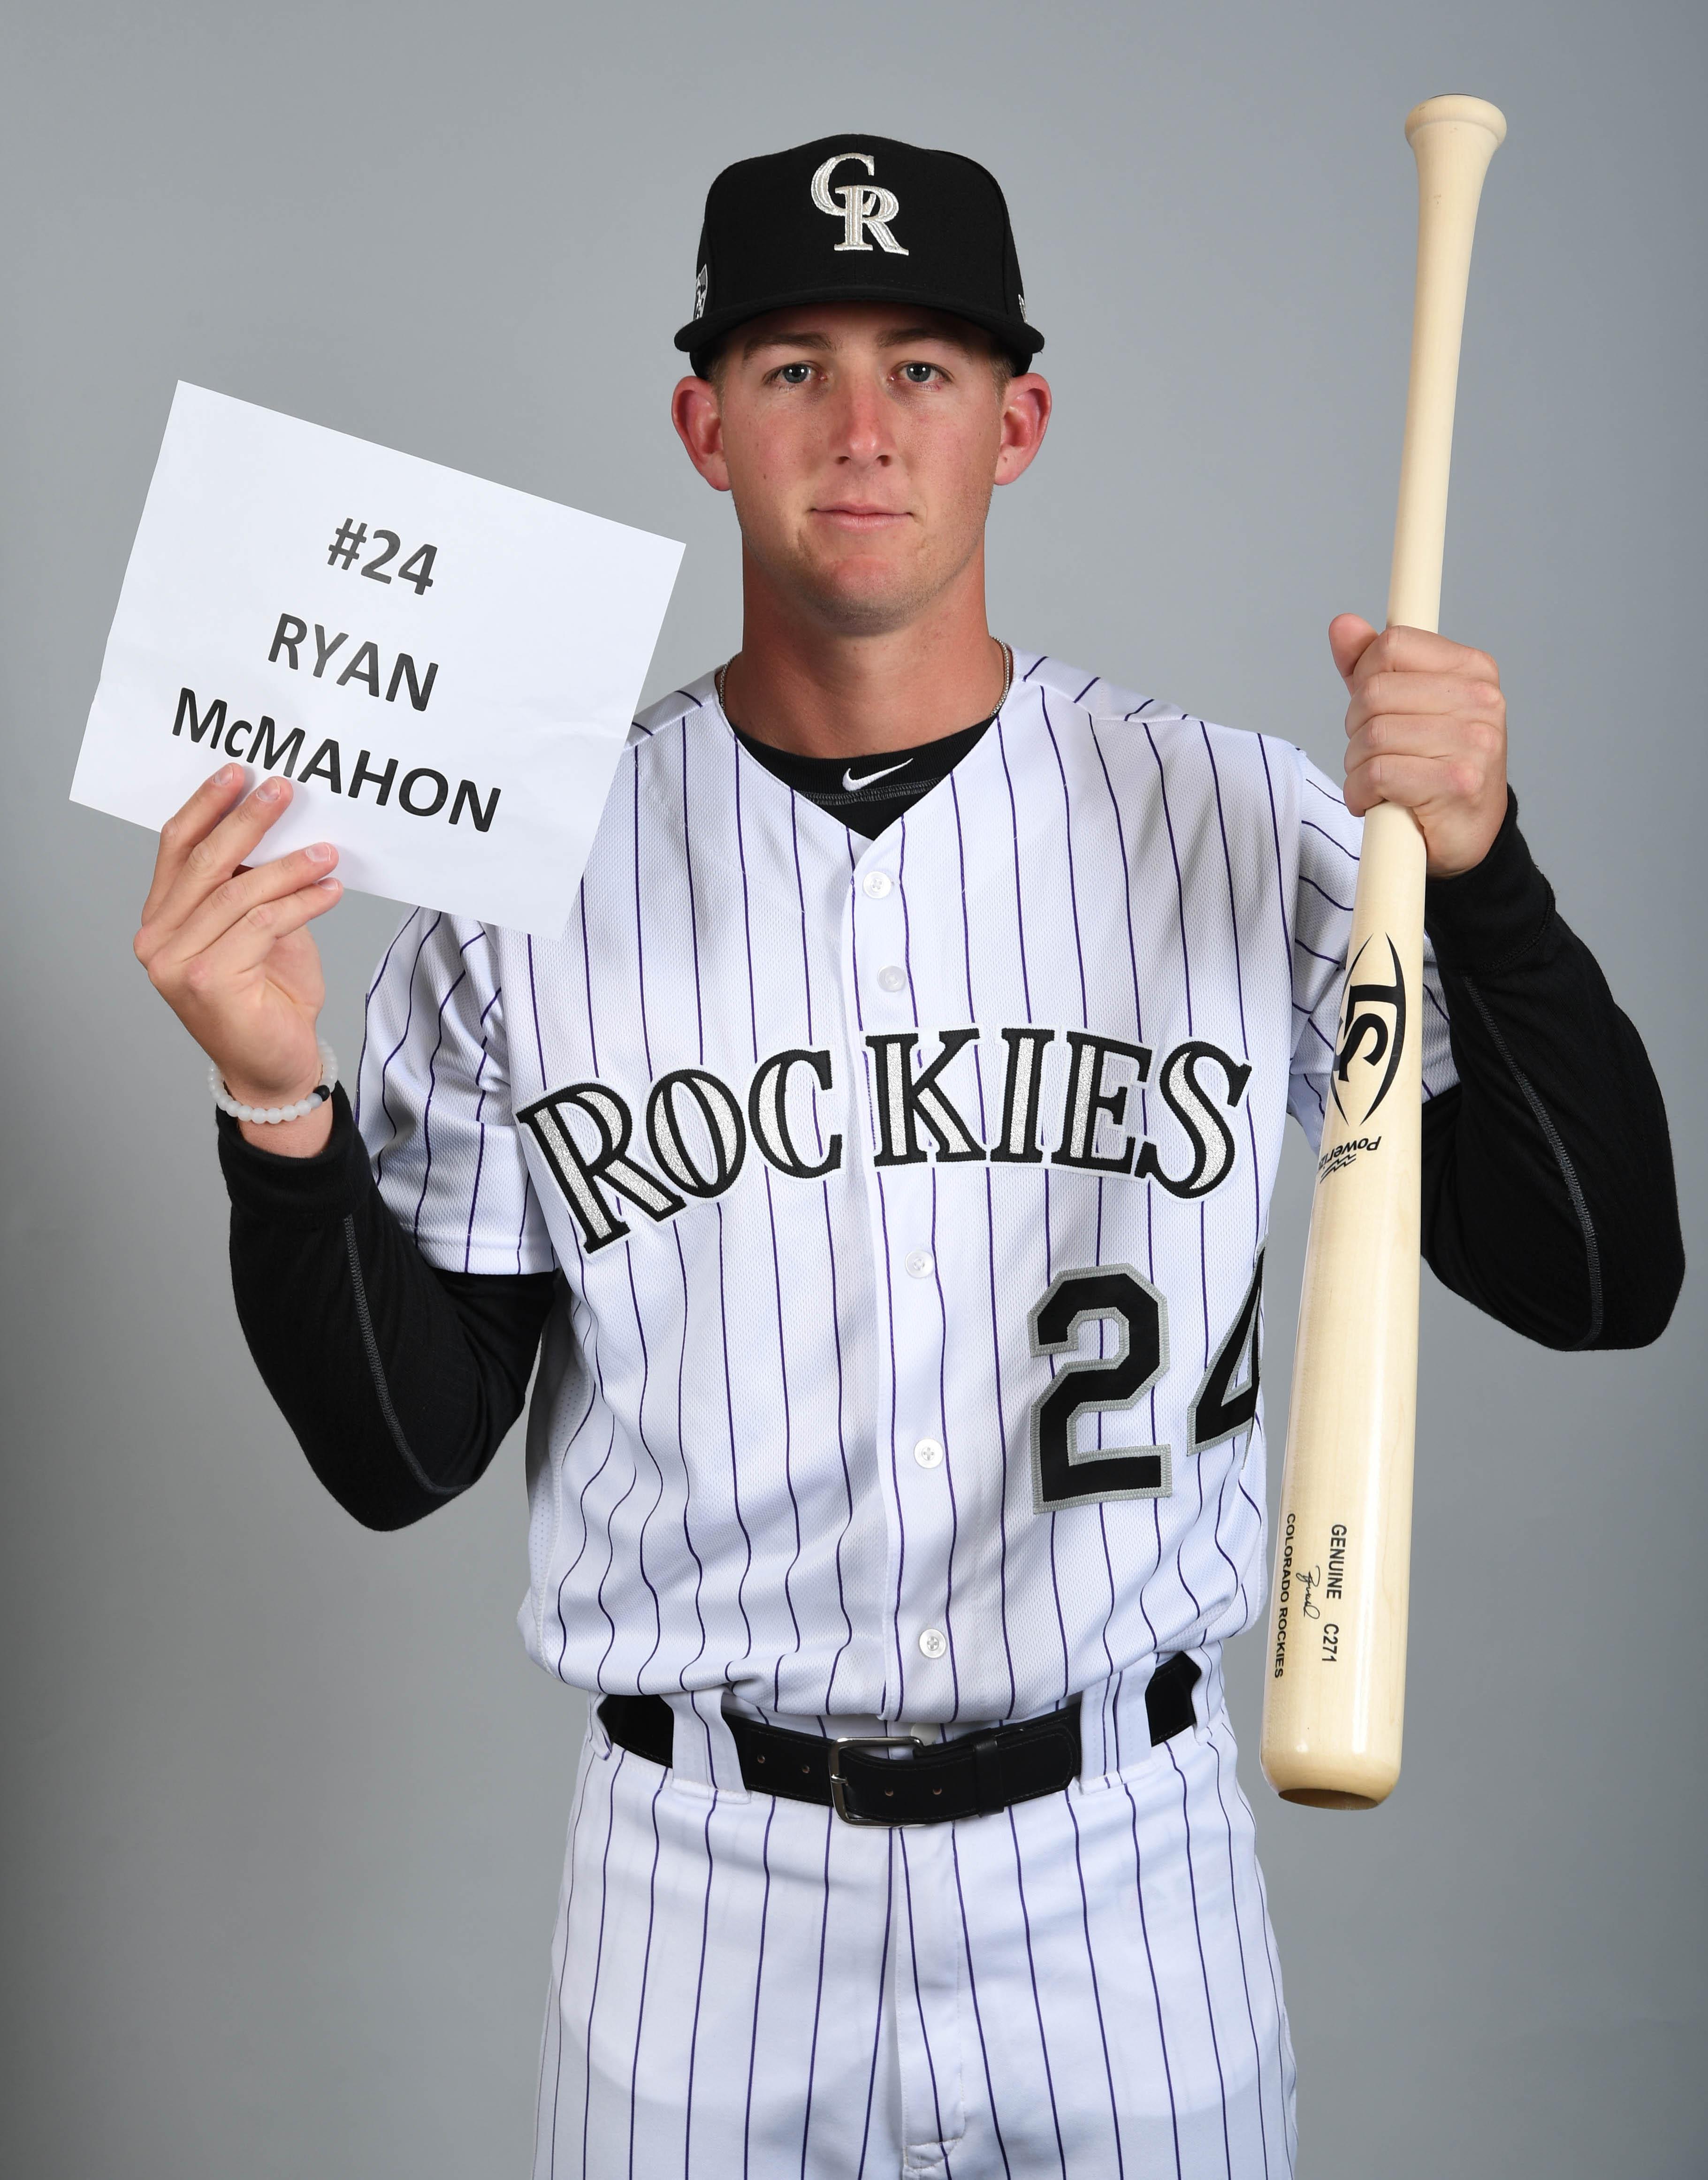 f660b9f5 Ryan McMahon's journey culminates with a Rockies' roster spot - Purple Row